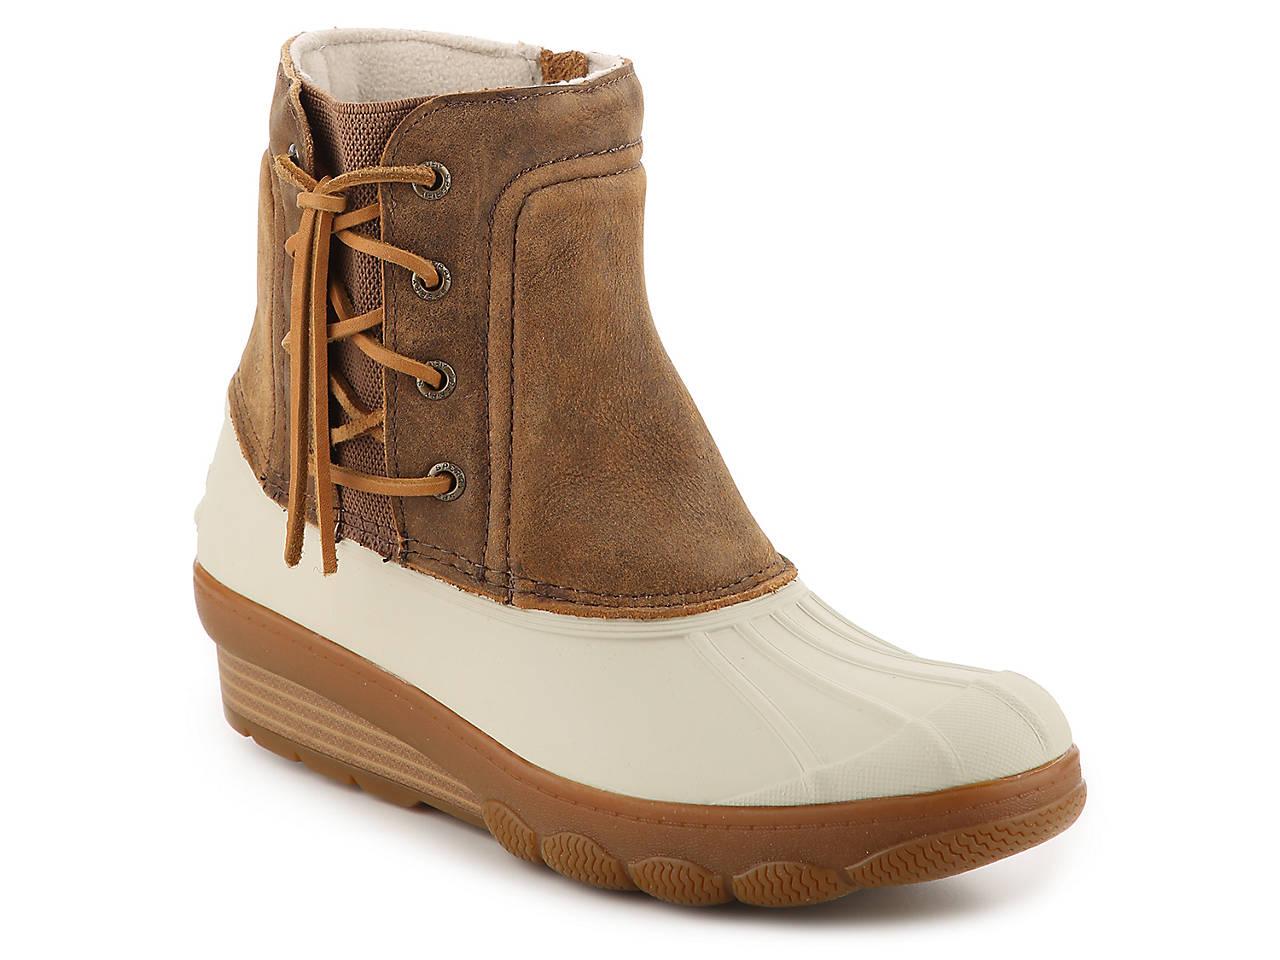 26d41d305096 Sperry Top-Sider Saltwater Spray Wedge Duck Boot Women s Shoes